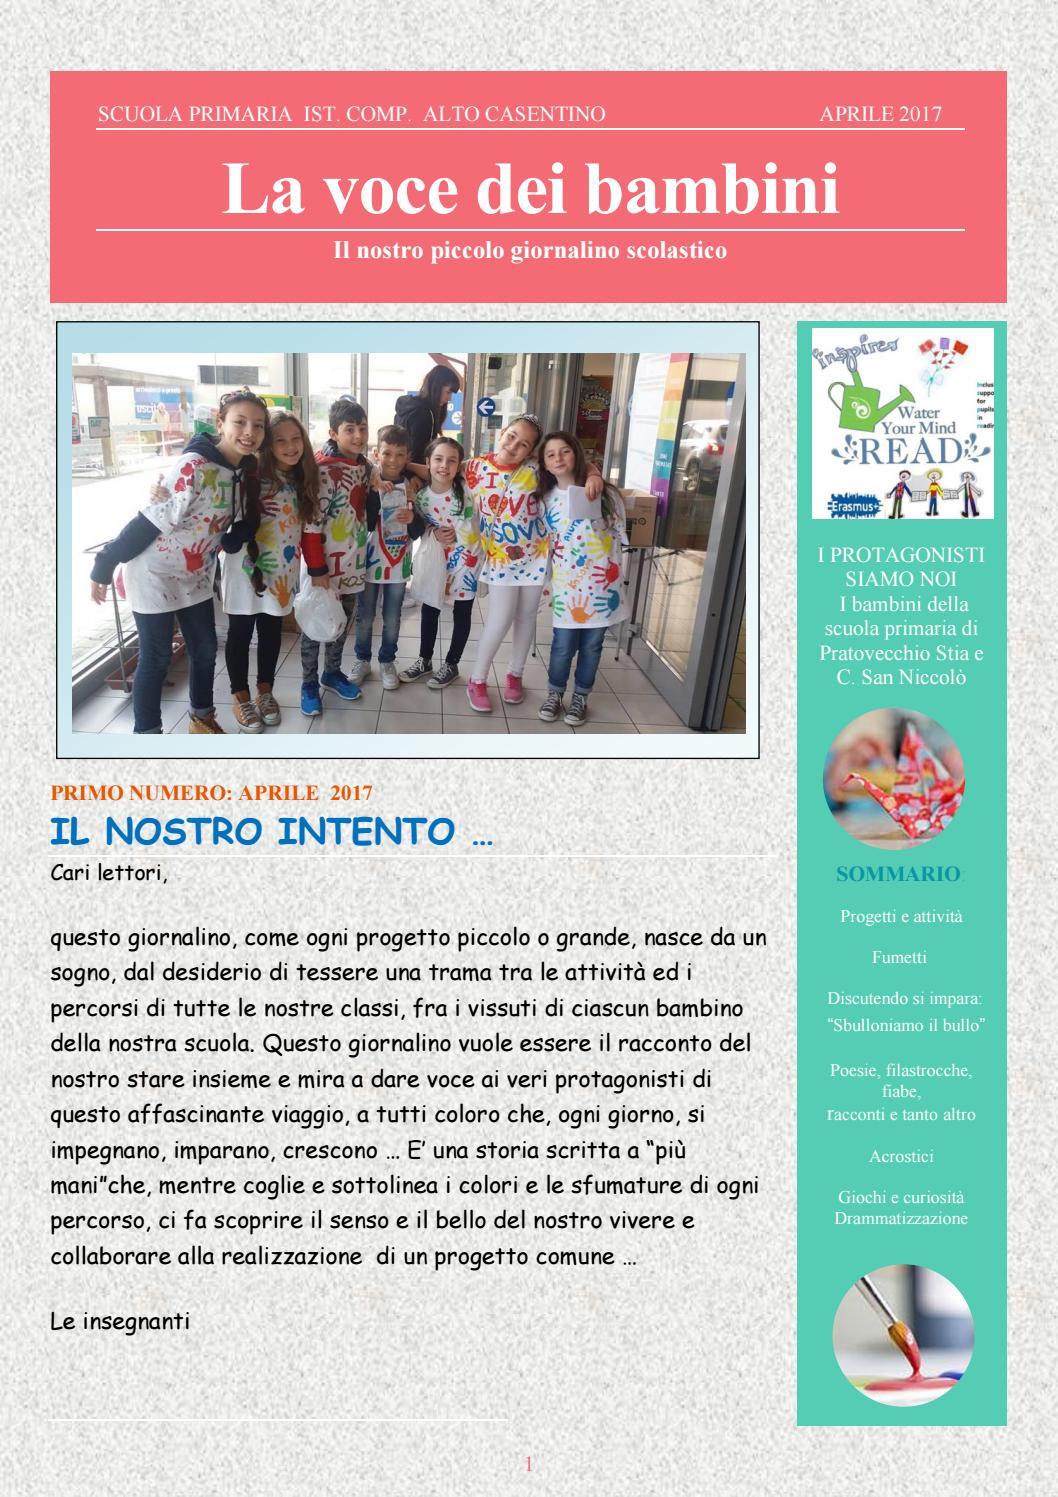 Giornalino Italy By Stefania Boschi Issuu